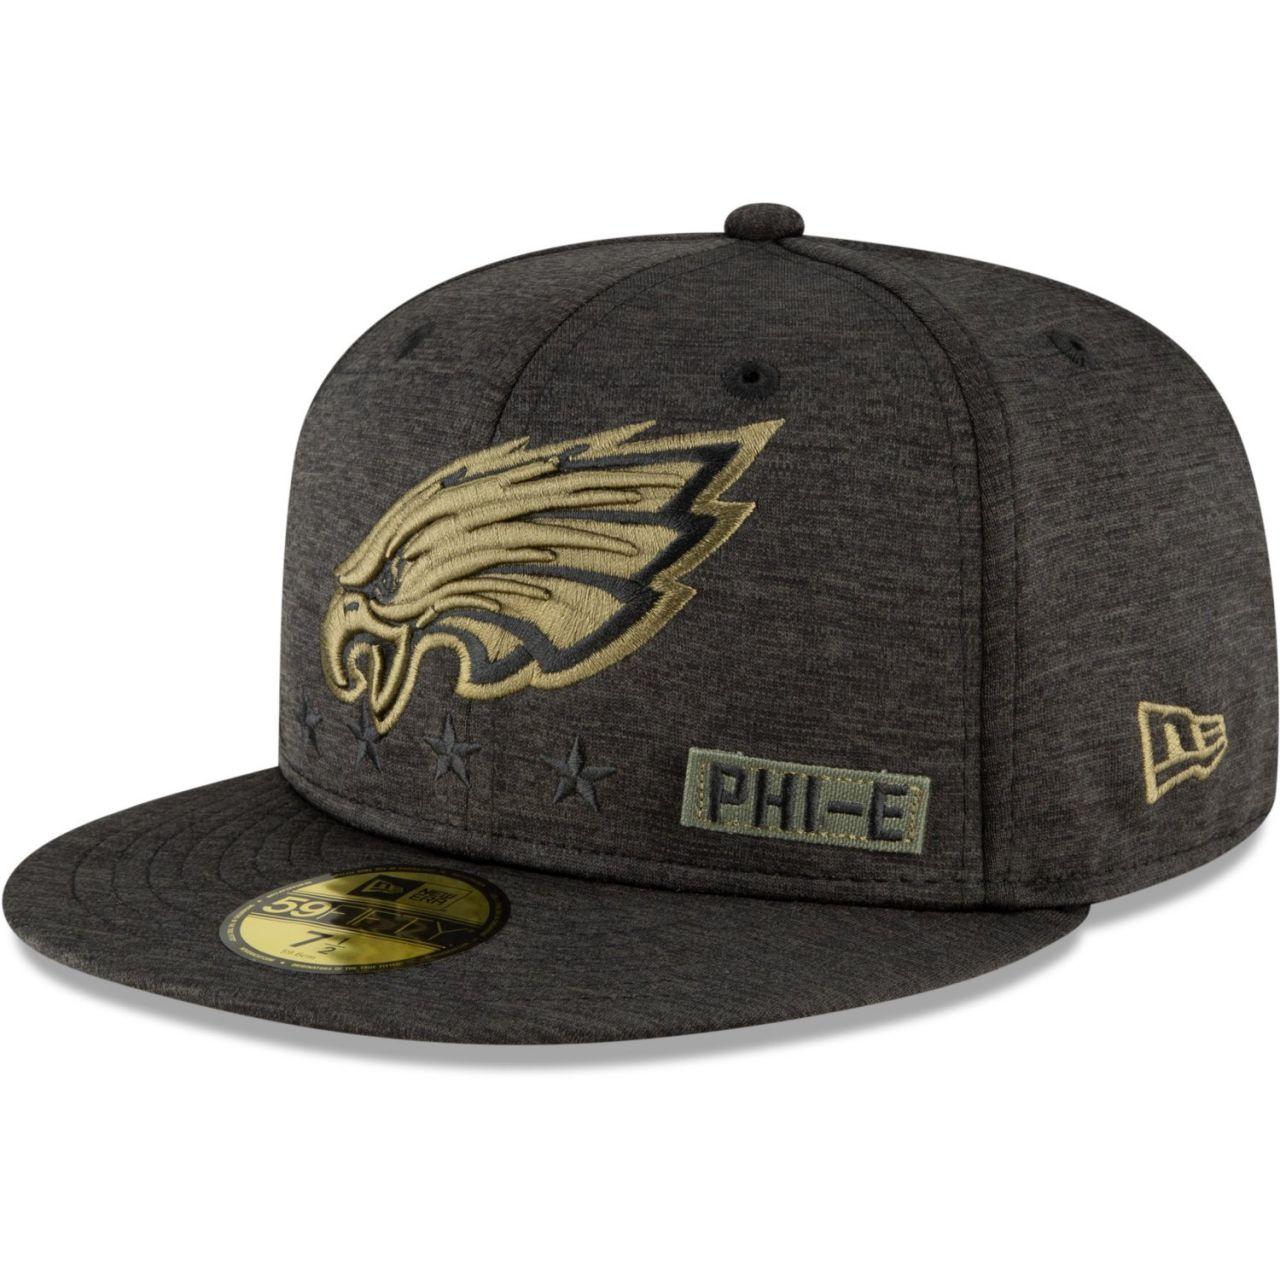 amfoo - New Era 59FIFTY Cap Salute to Service Philadelphia Eagles